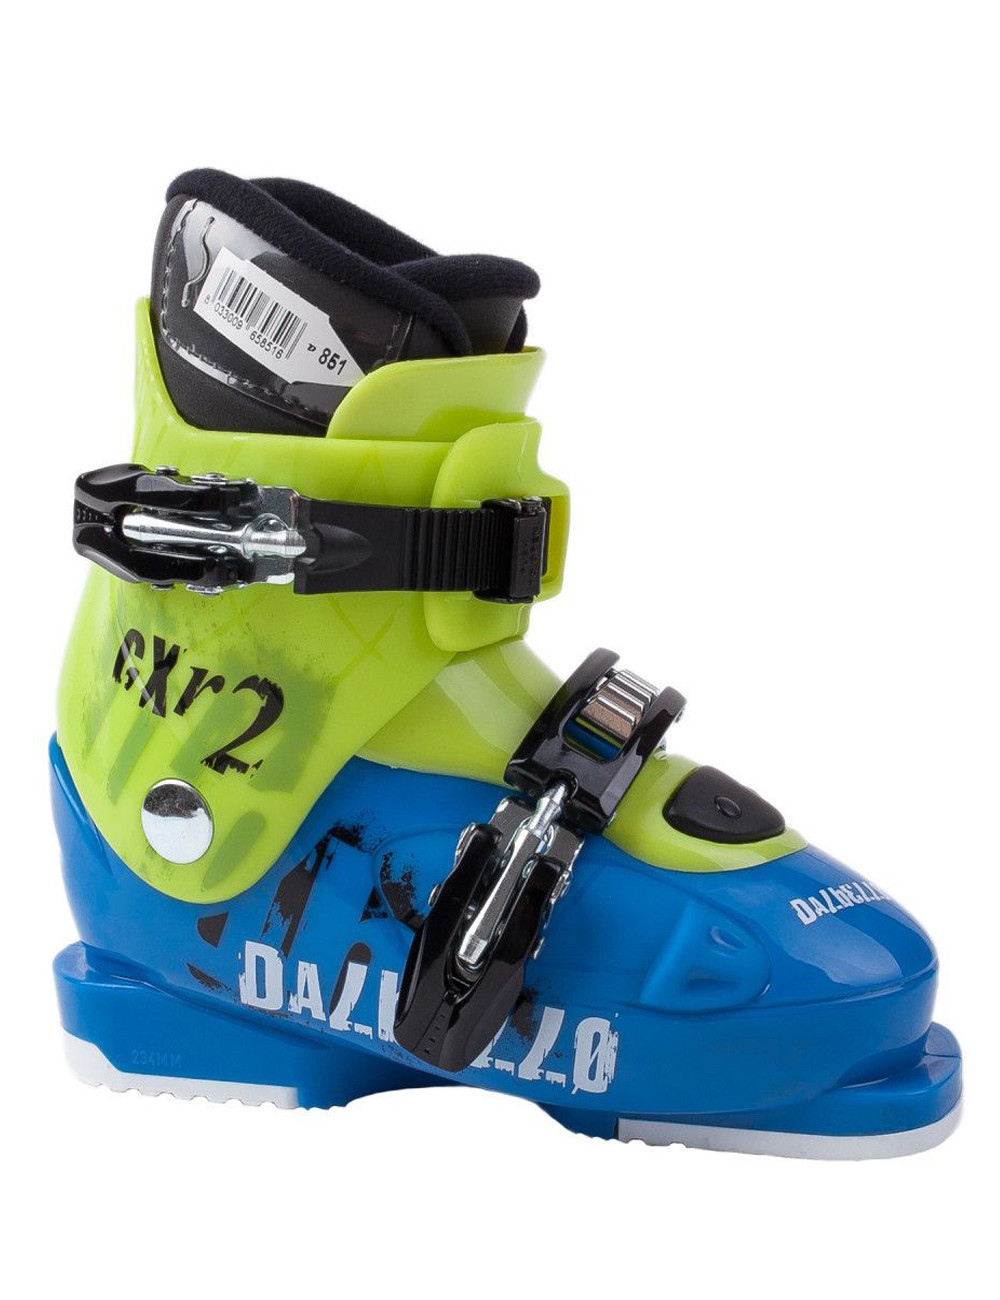 Buty narciarskie Dalbello Rtl-cxr 2 JR